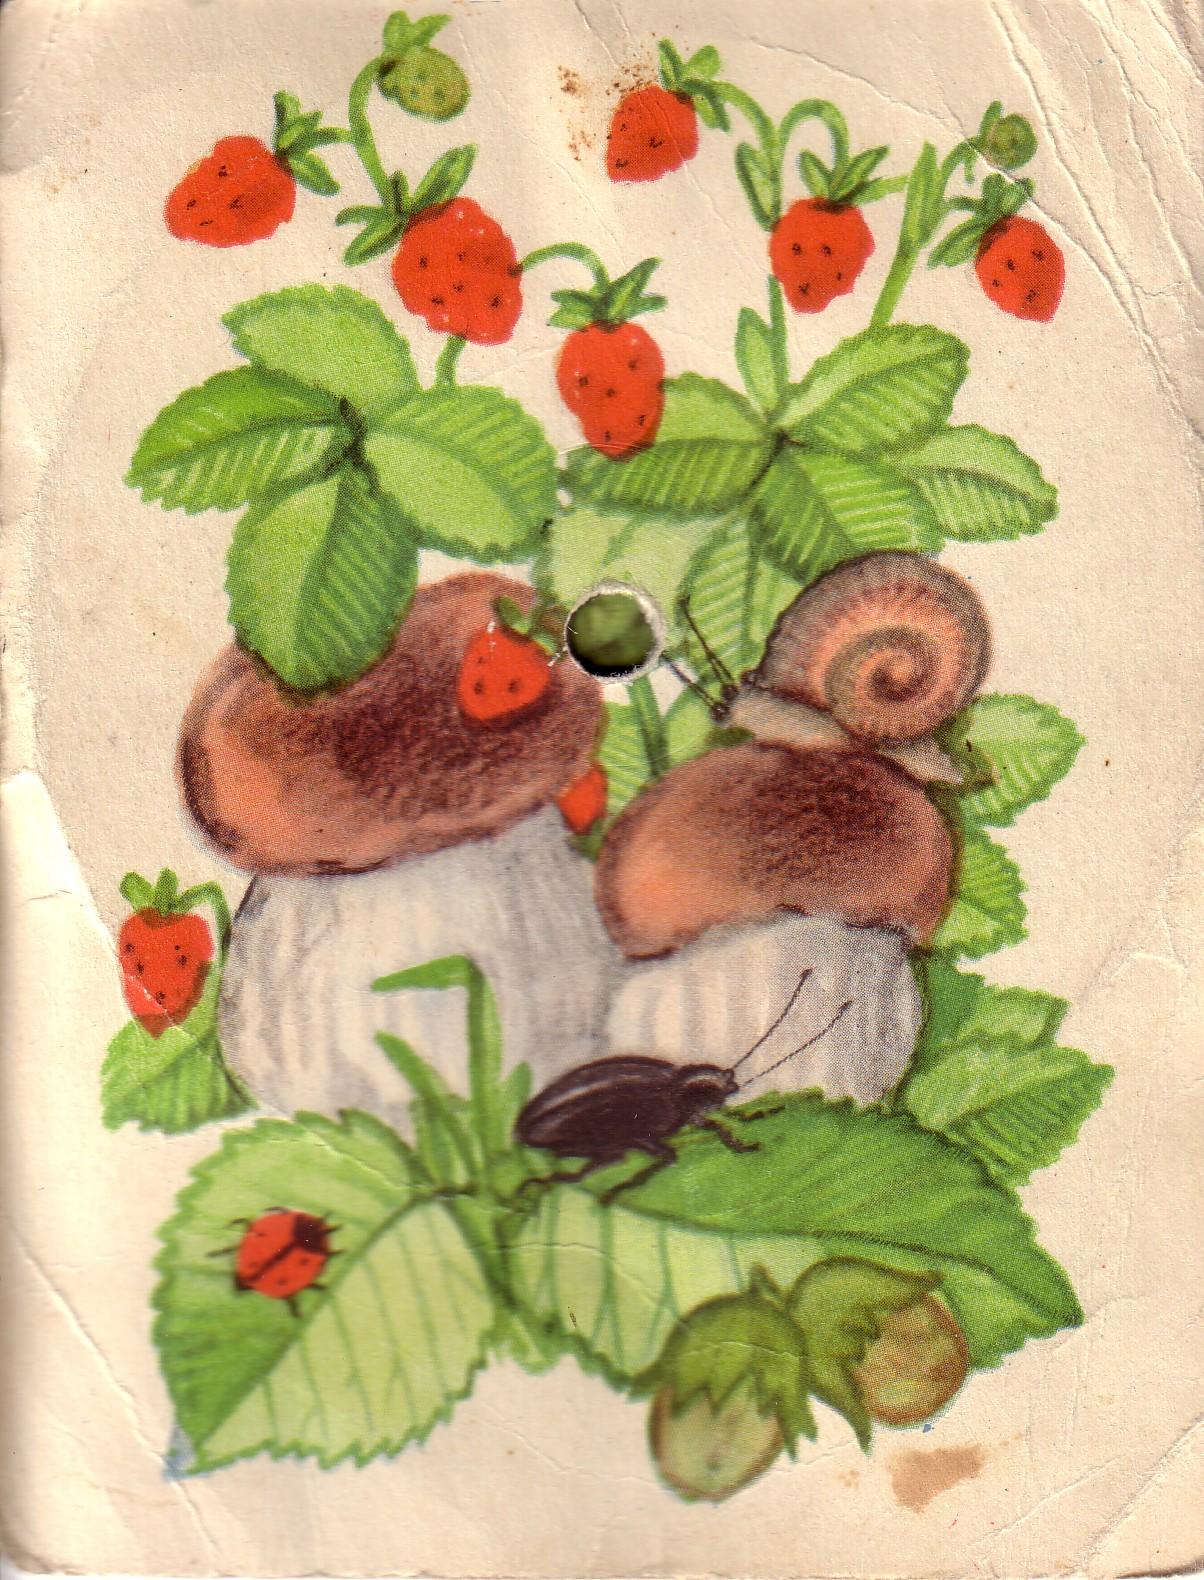 mushrooms and strawberries